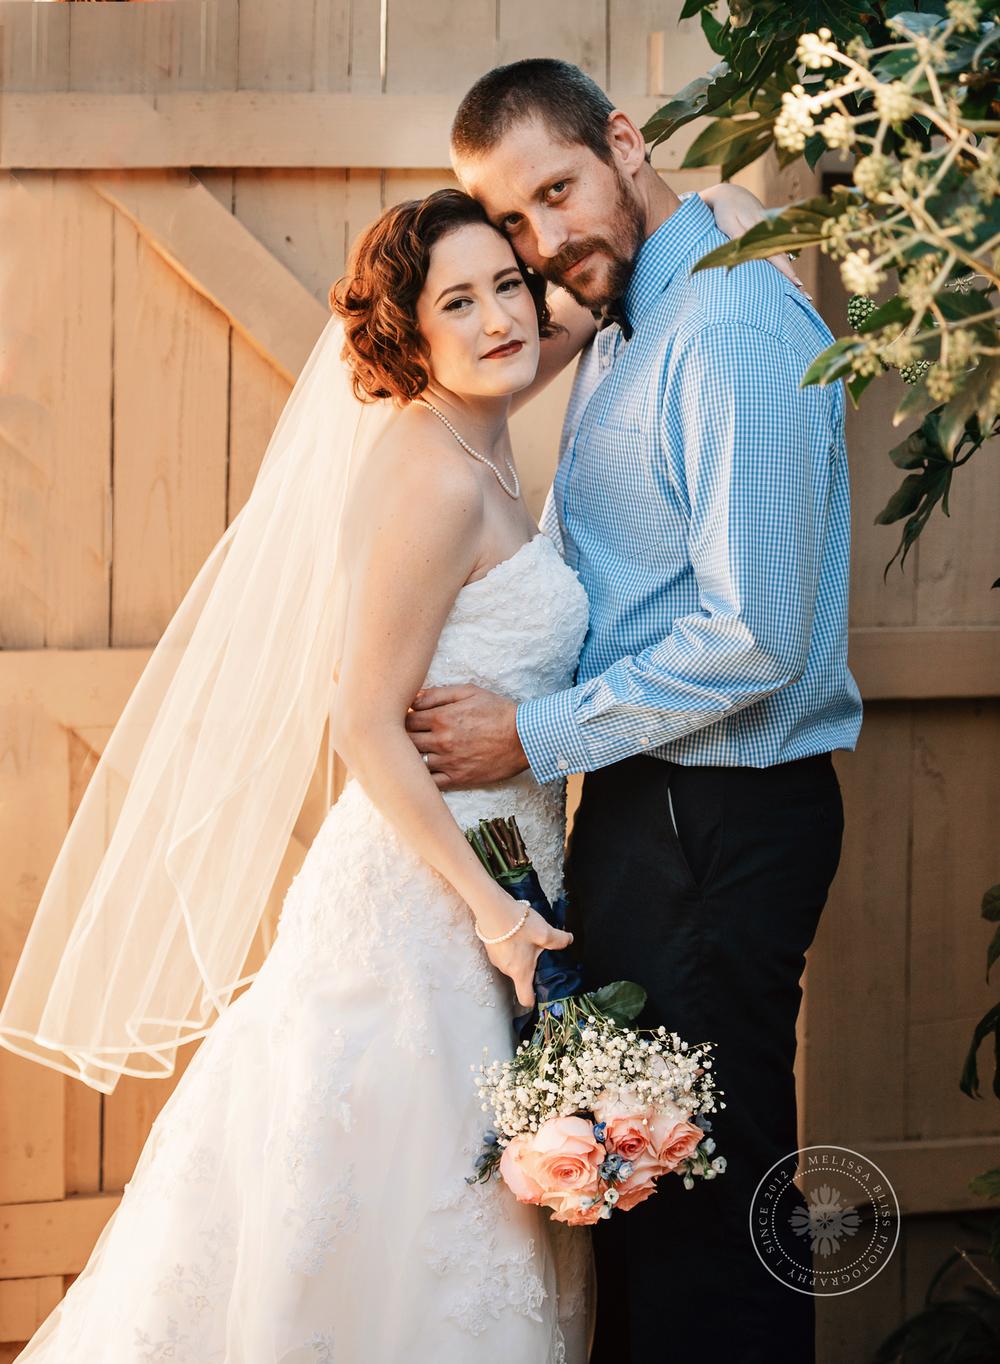 virginia-beach-wedding-photographers-real-weddings-winter-wedding-melissa-bliss-photography-norfolk-va-beach-portsmouth-wedding-photographer